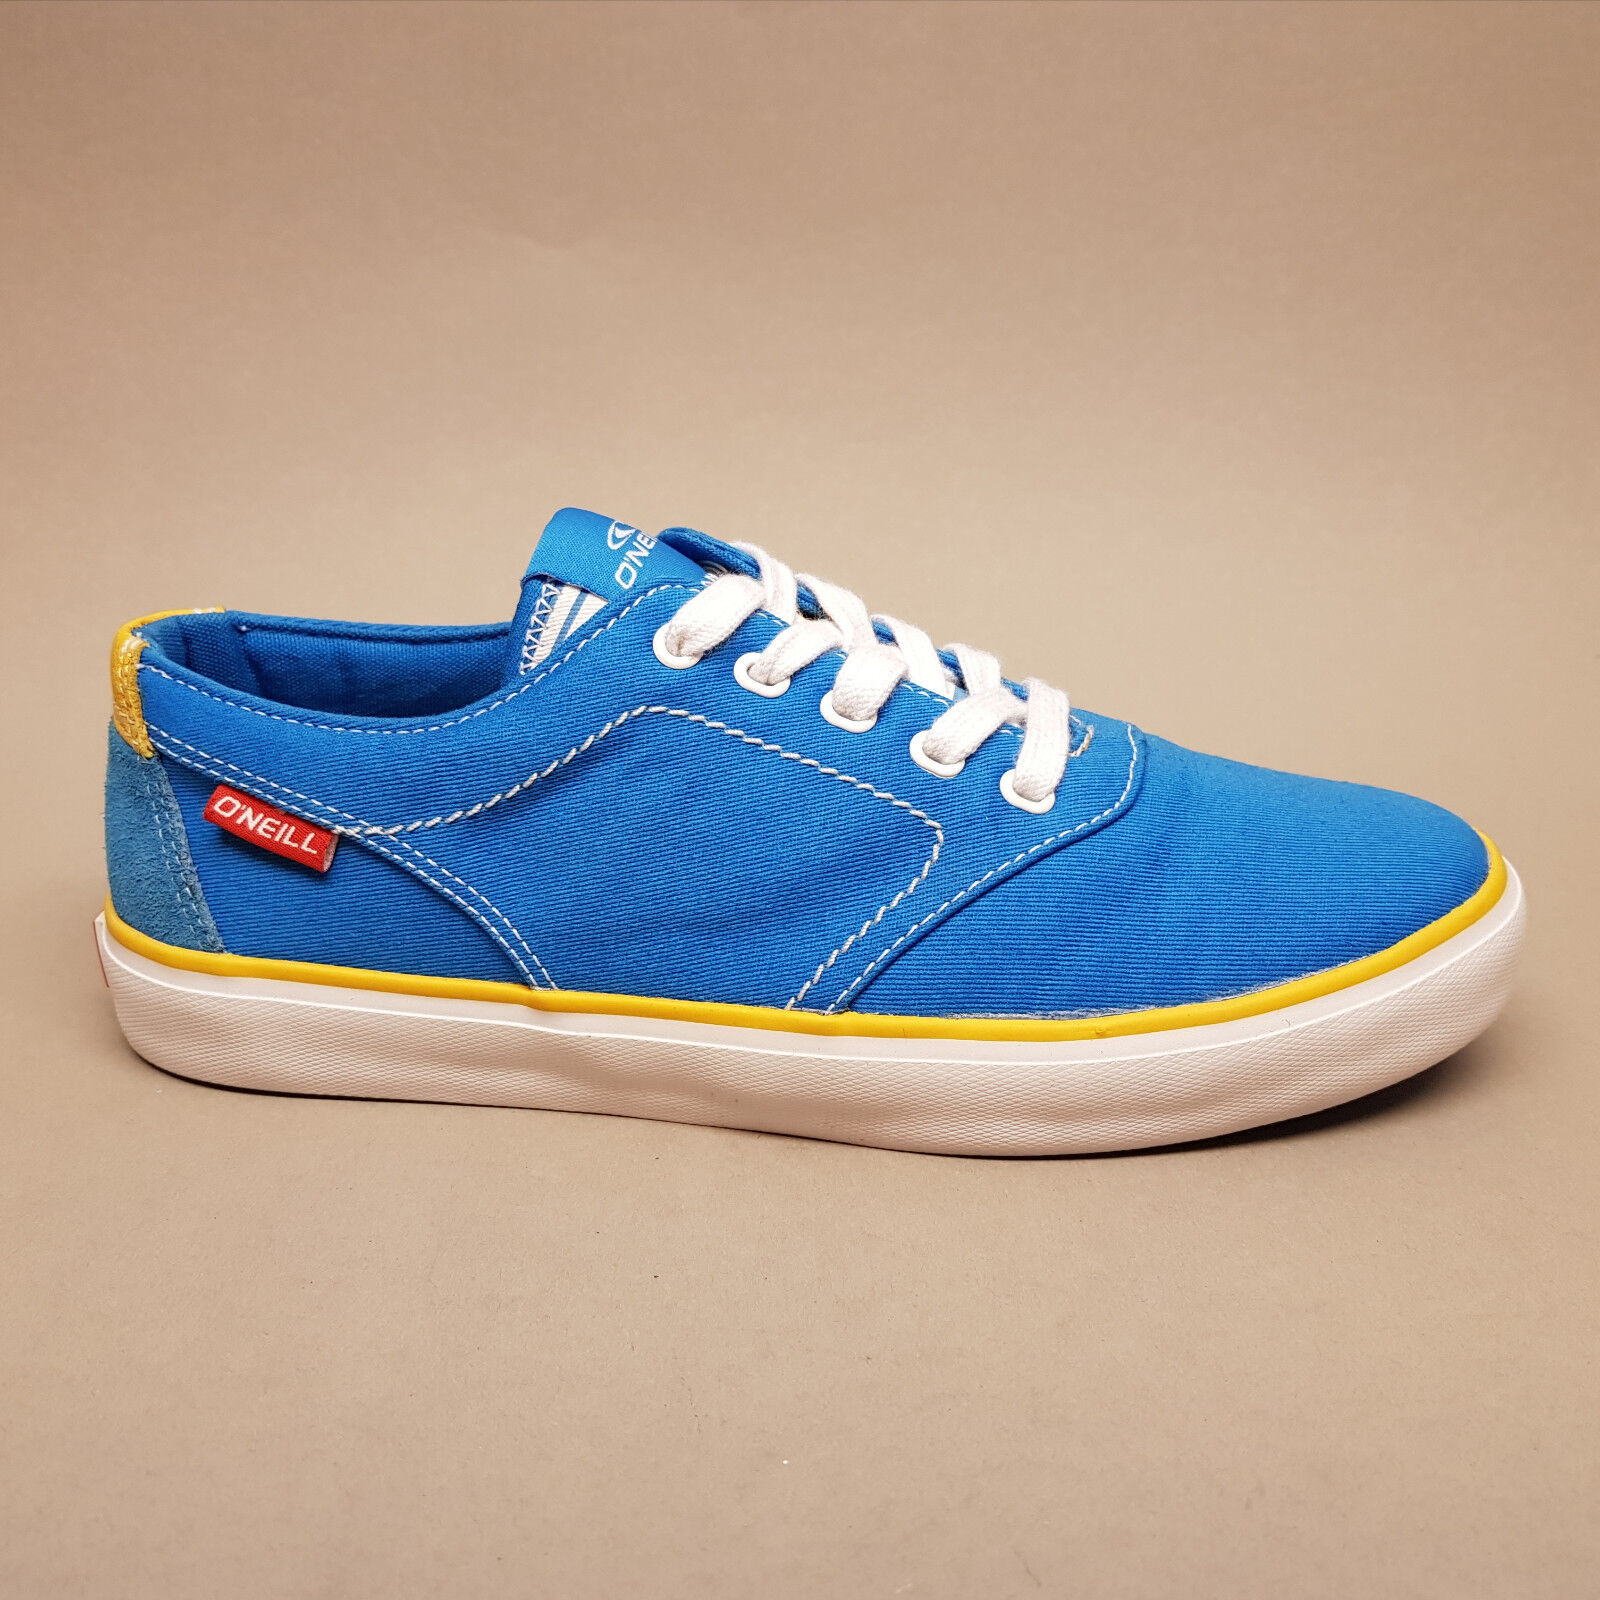 Neill Psycho 59.1074.04 S17 Turnschuhe Sneaker blau  39  42  46